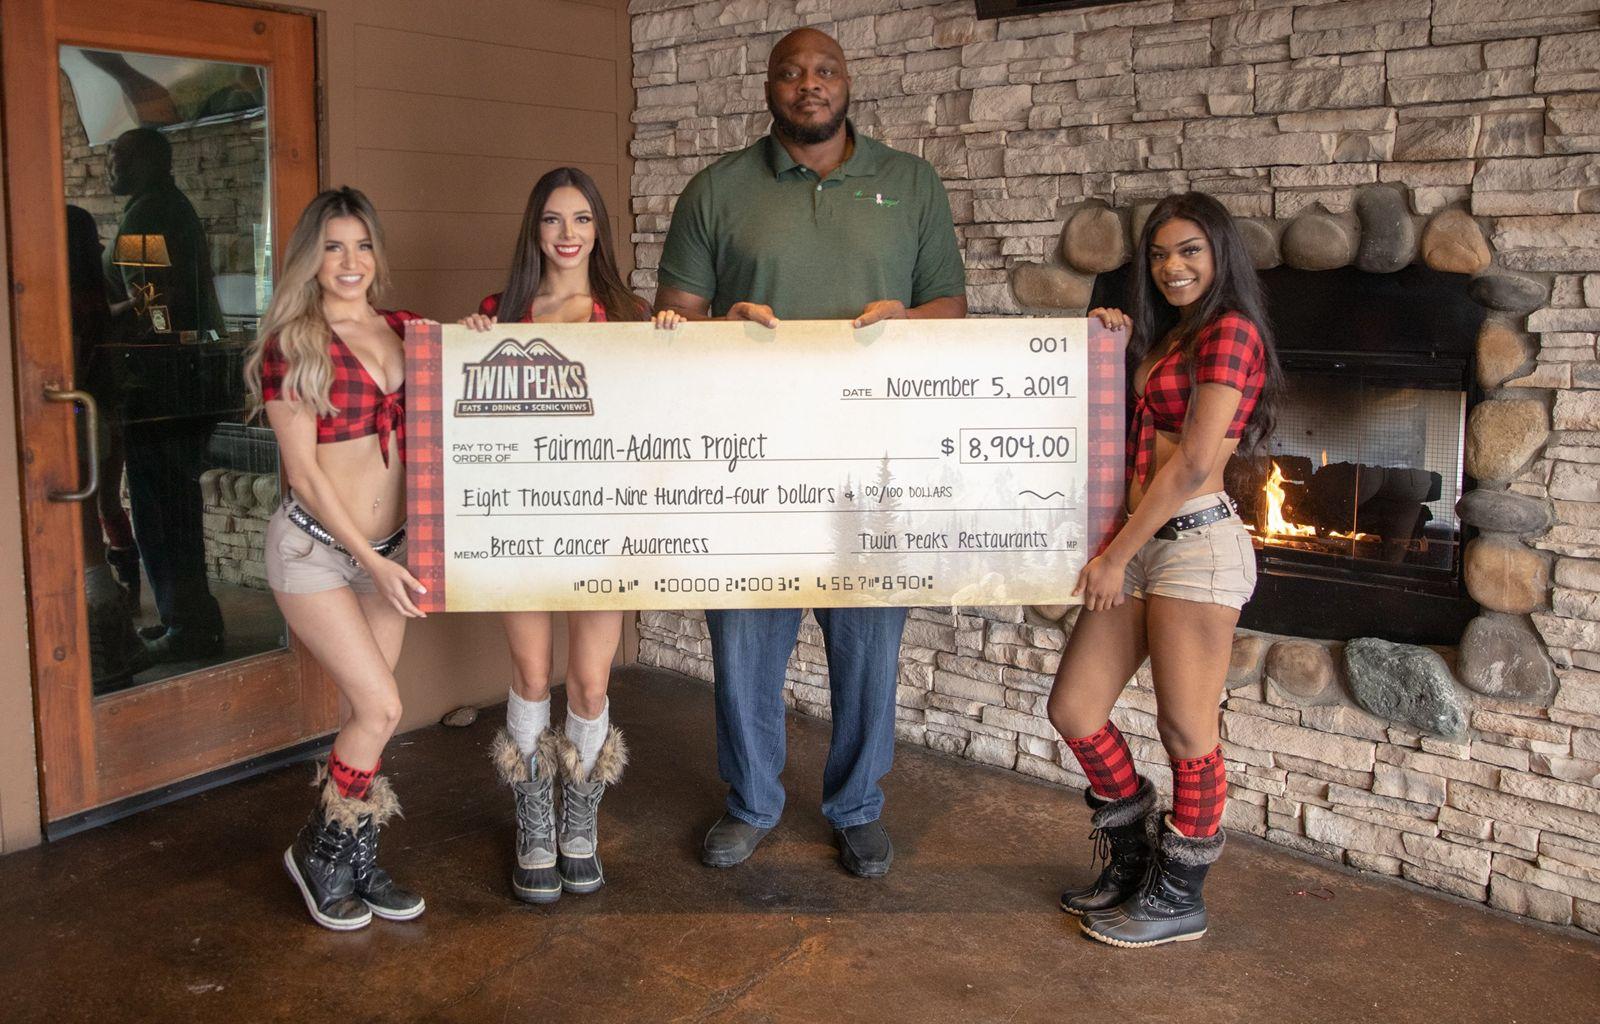 Twin Peaks Donates Nearly $9,000 to Fairman Adams Project